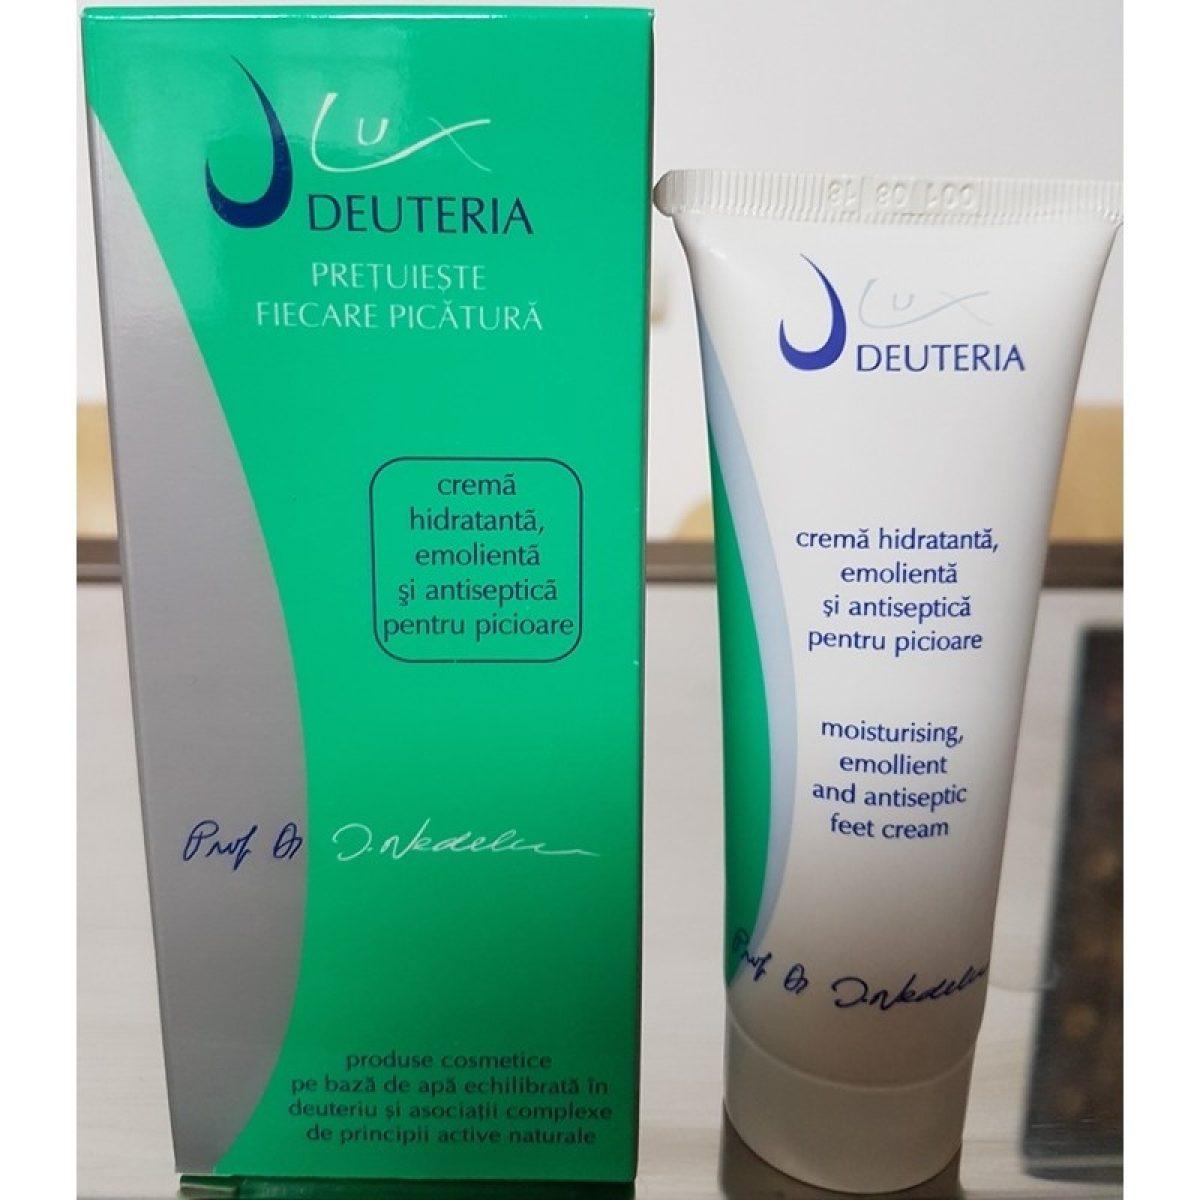 Crema hidratanta, emolienta si antiseptica pentru picioare